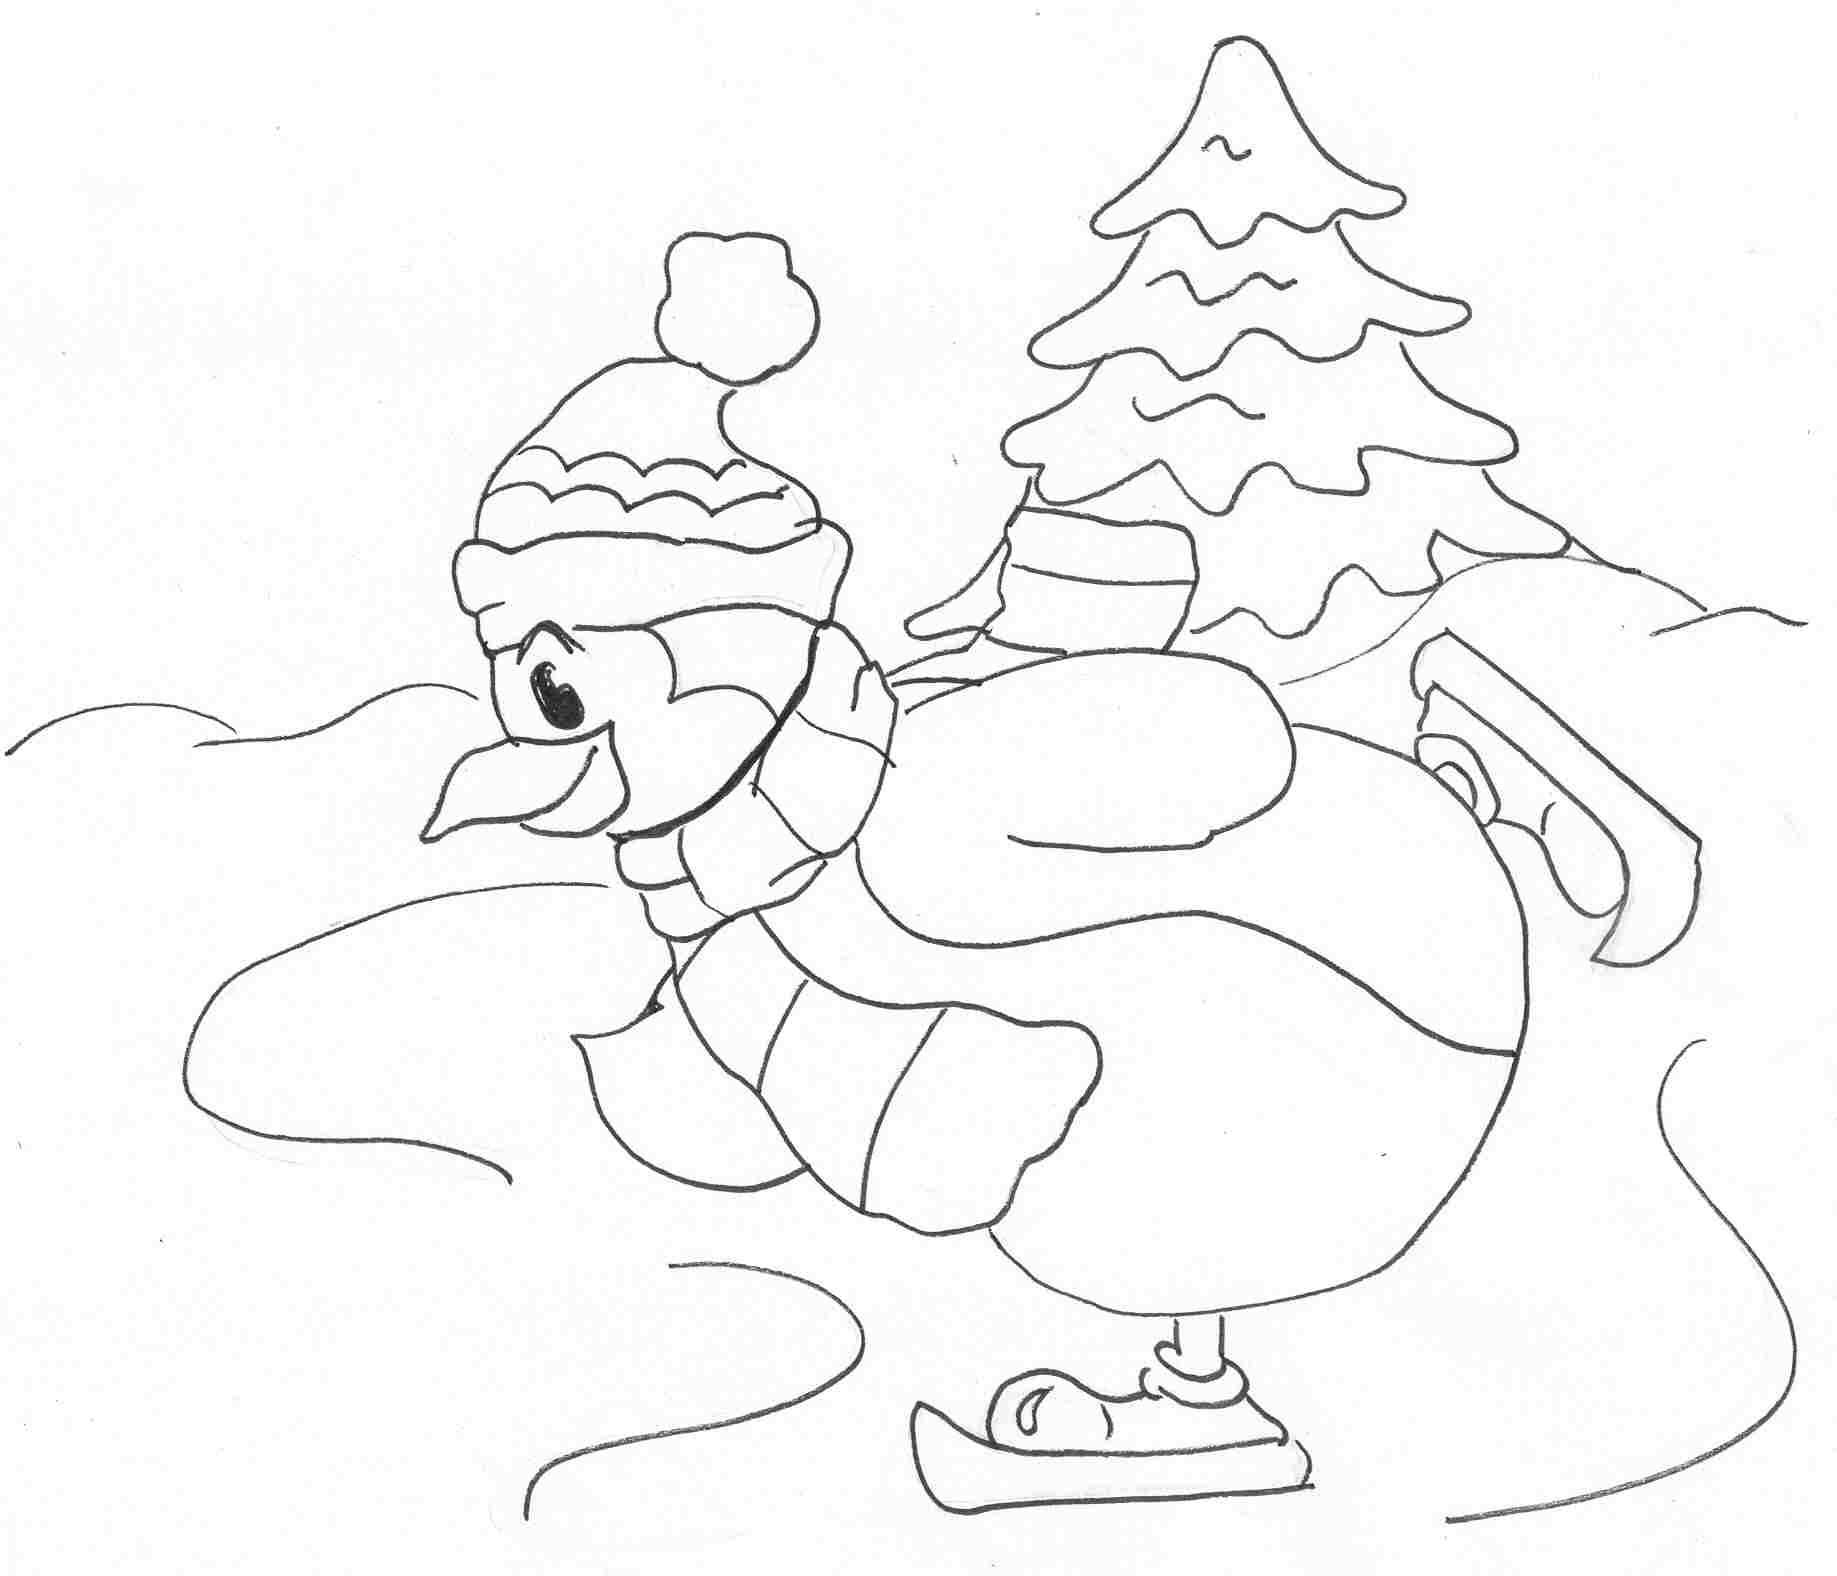 Dessin plouk pingouin - Coloriage minable le pingouin ...